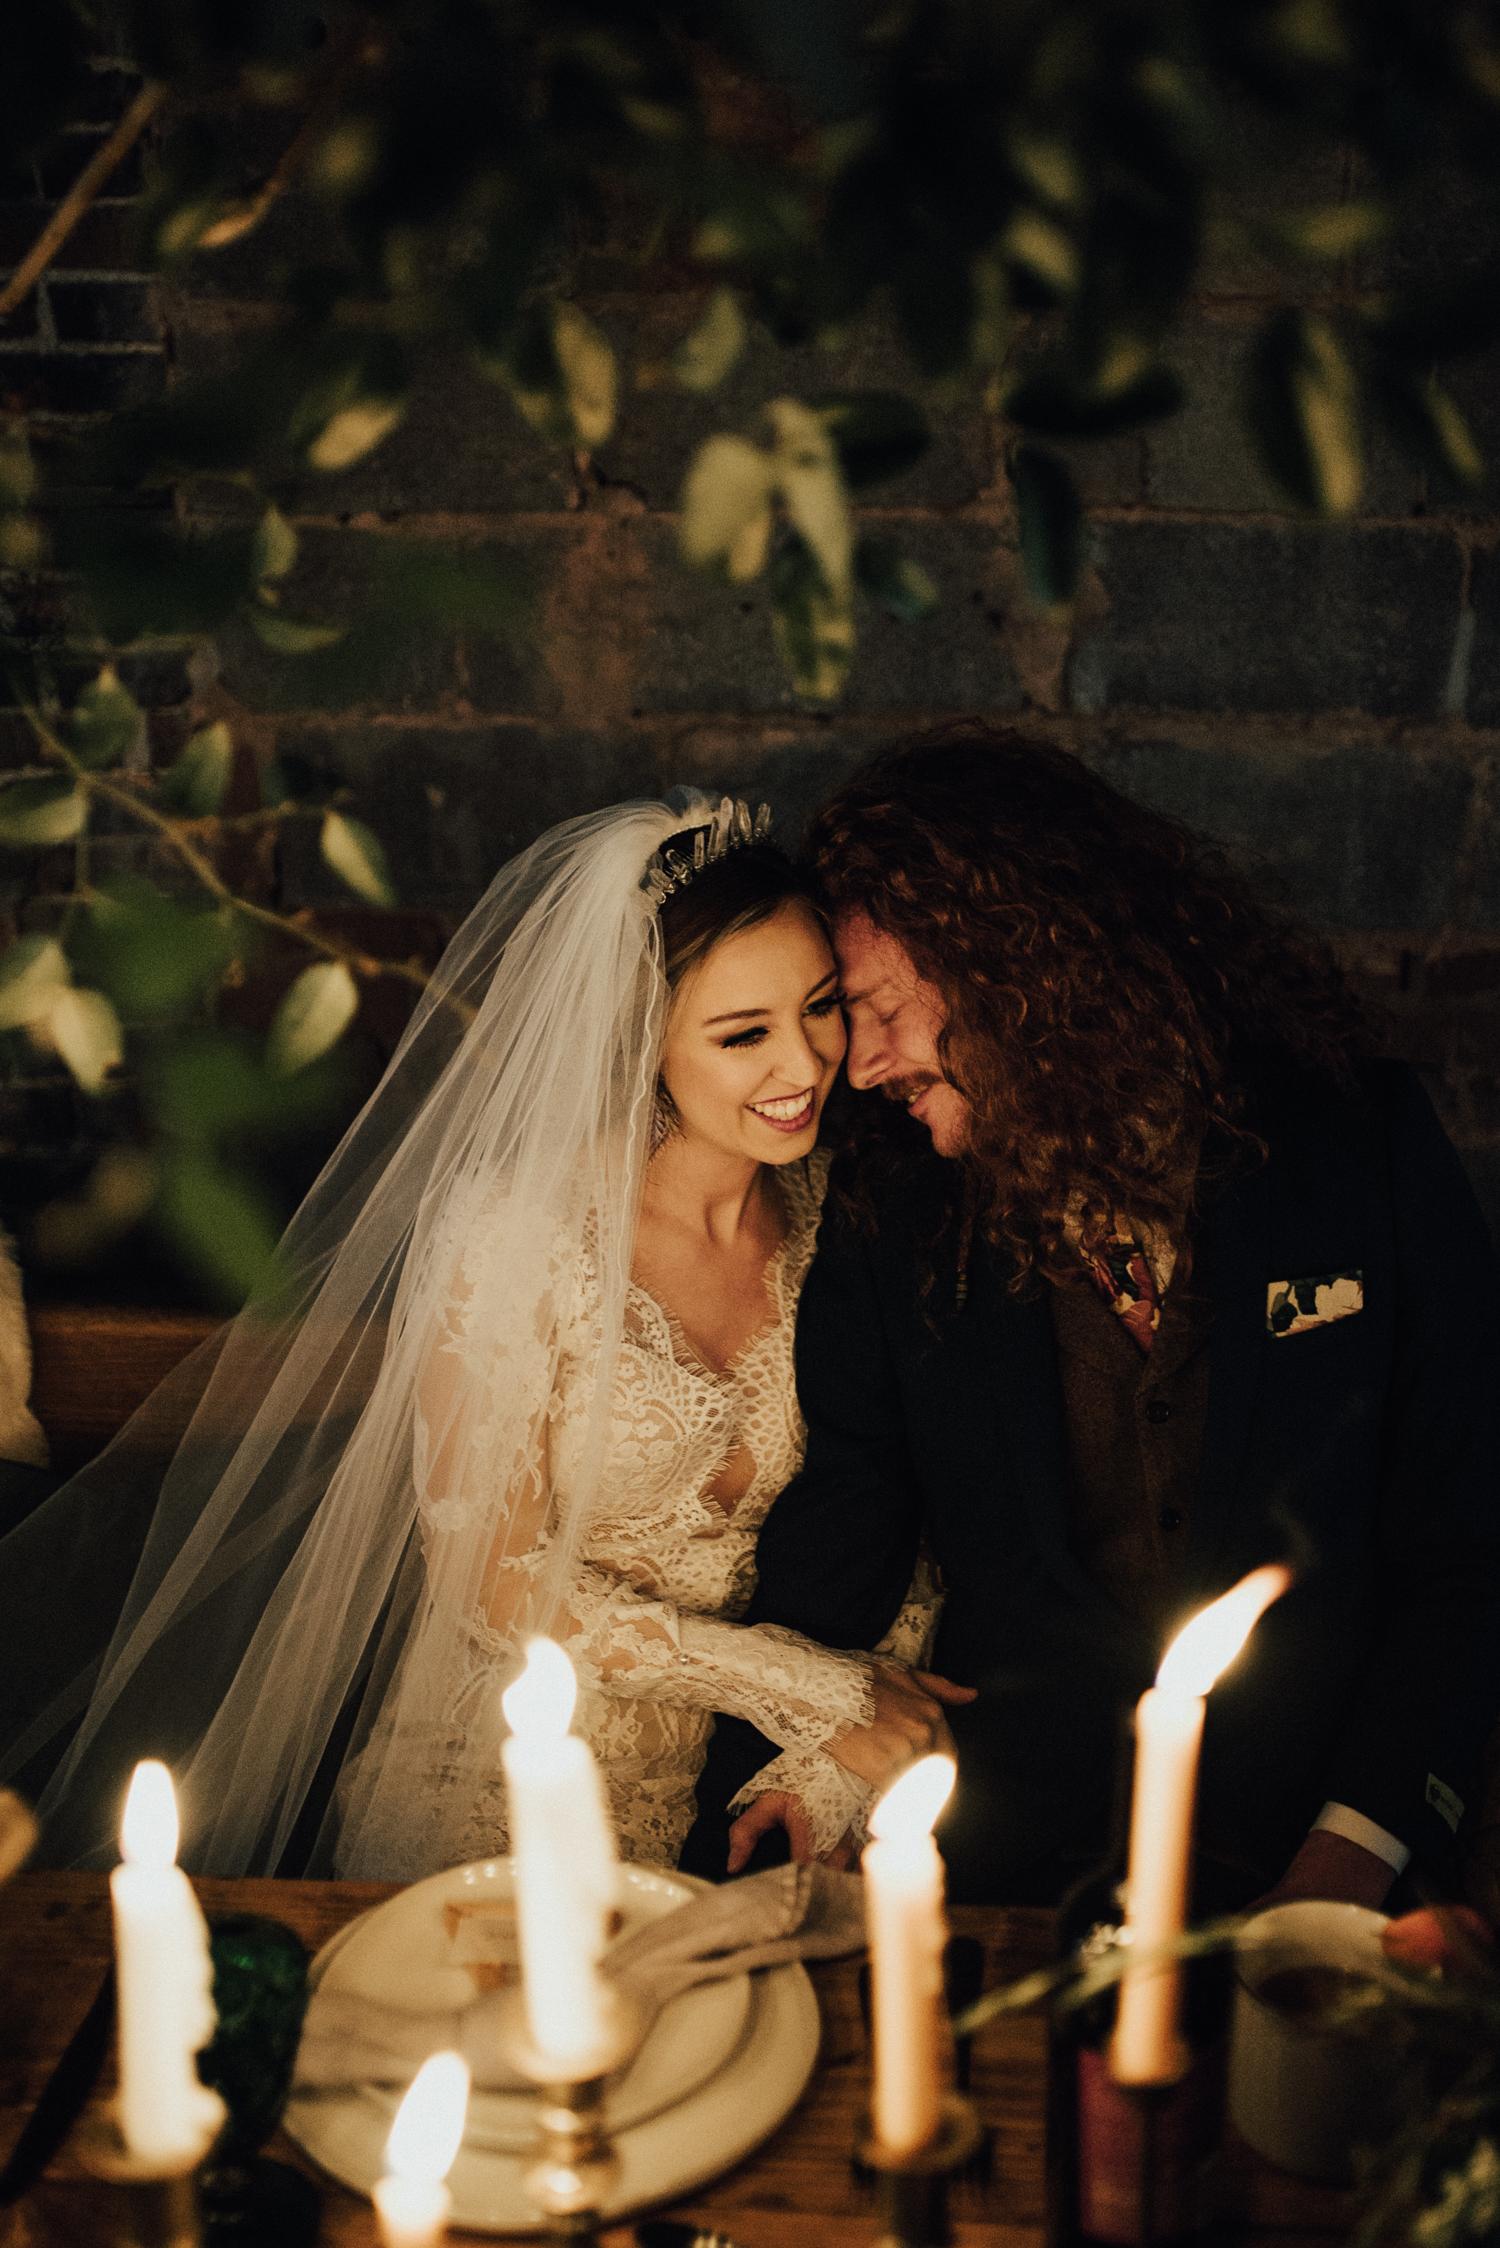 St-Louis-wedding-photographers-107.jpg